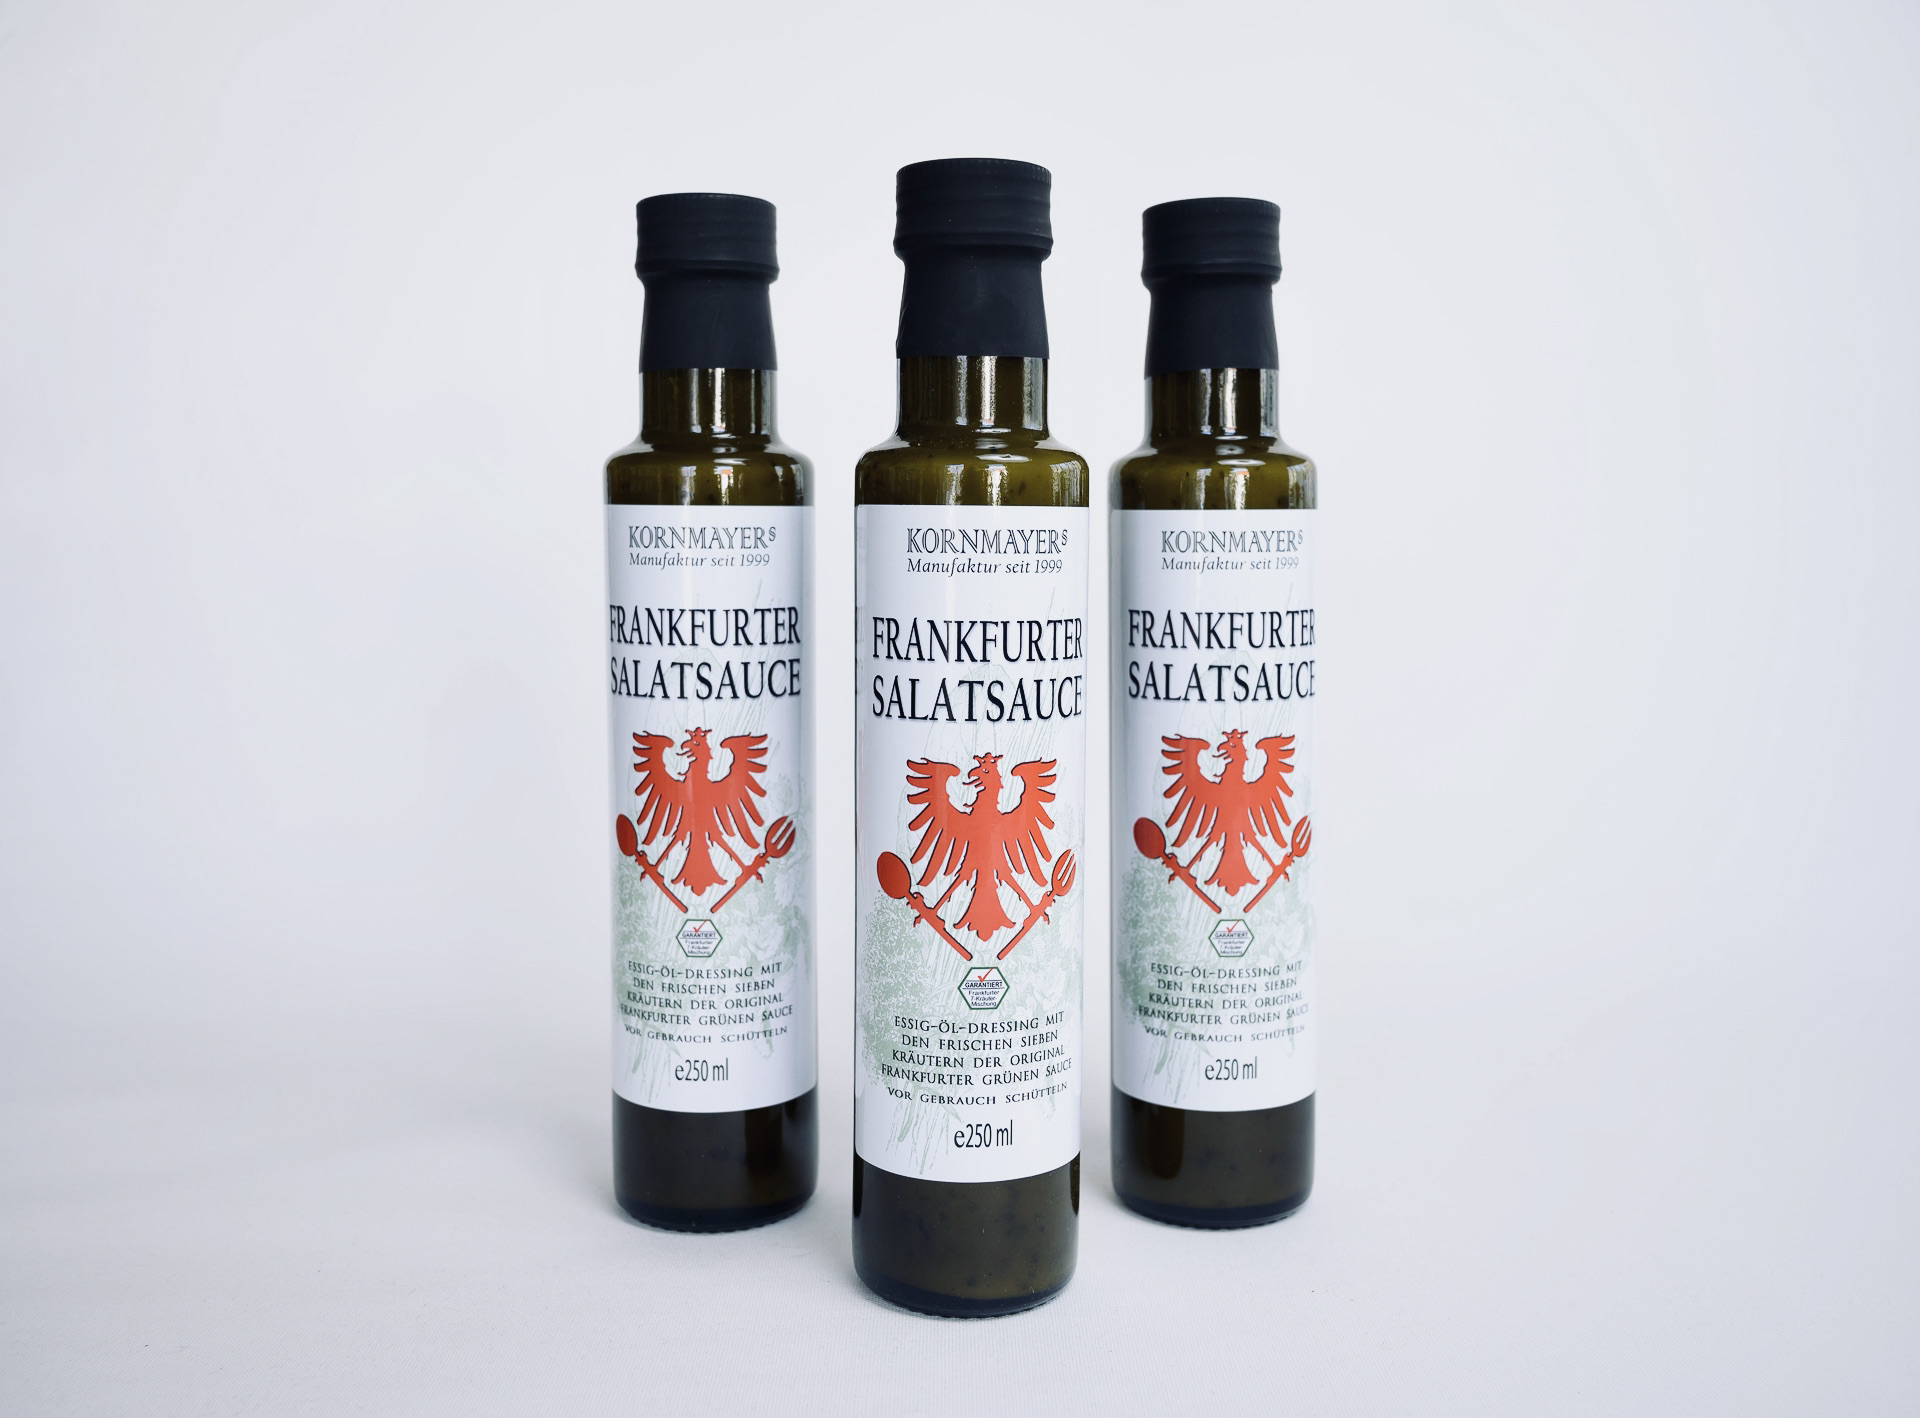 Salatsoße, Frankfurt, Frankfurter Salatsoße, Hessische Spezialitäten